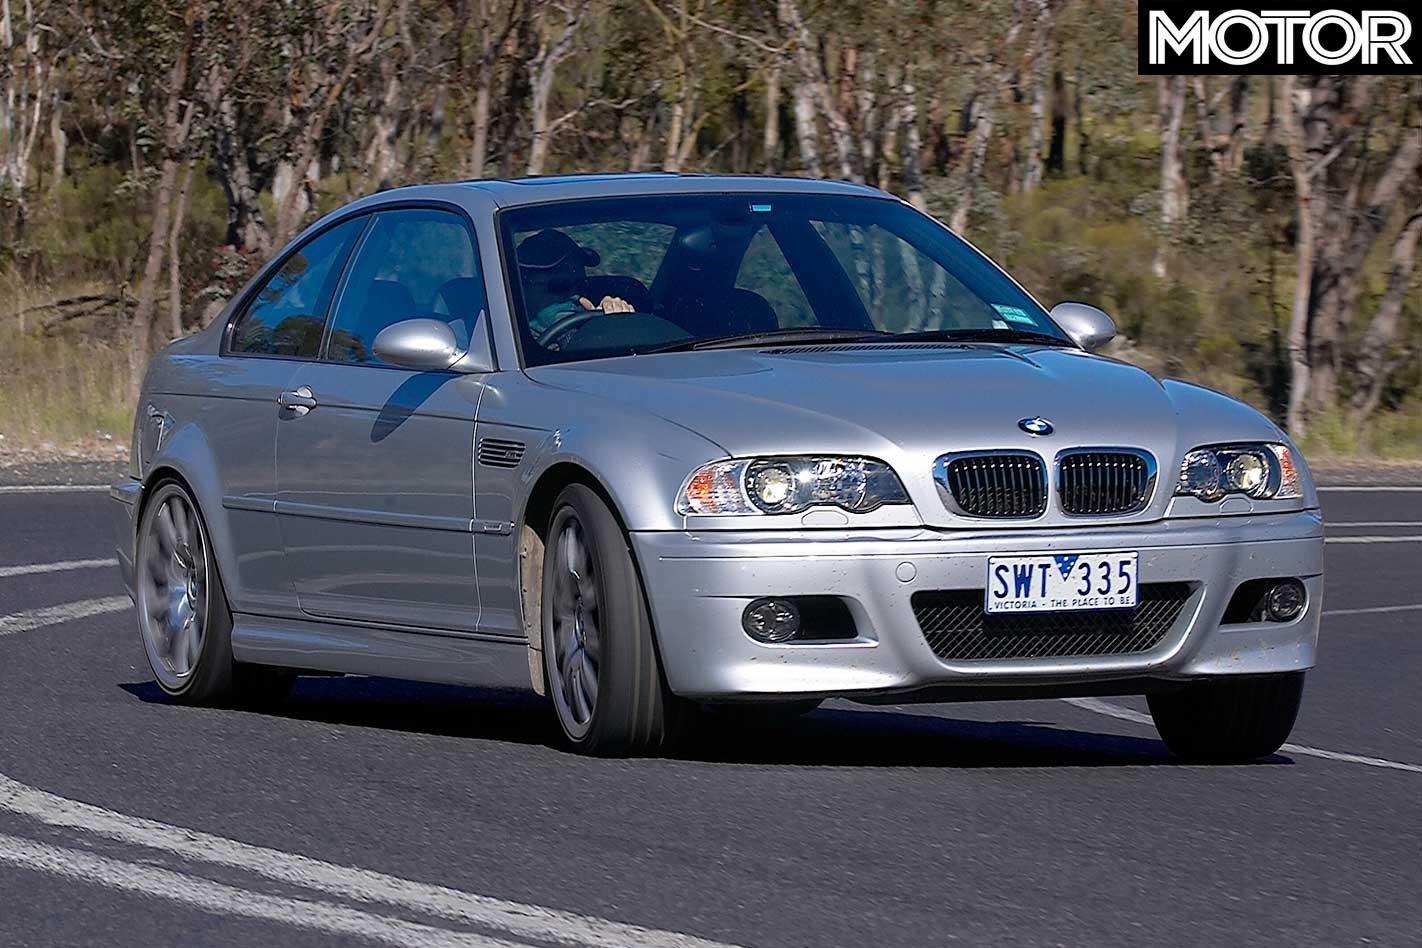 2005 Bmw M3 Vs Mercedes Benz C55 Amg Comparison Review Classic Motor